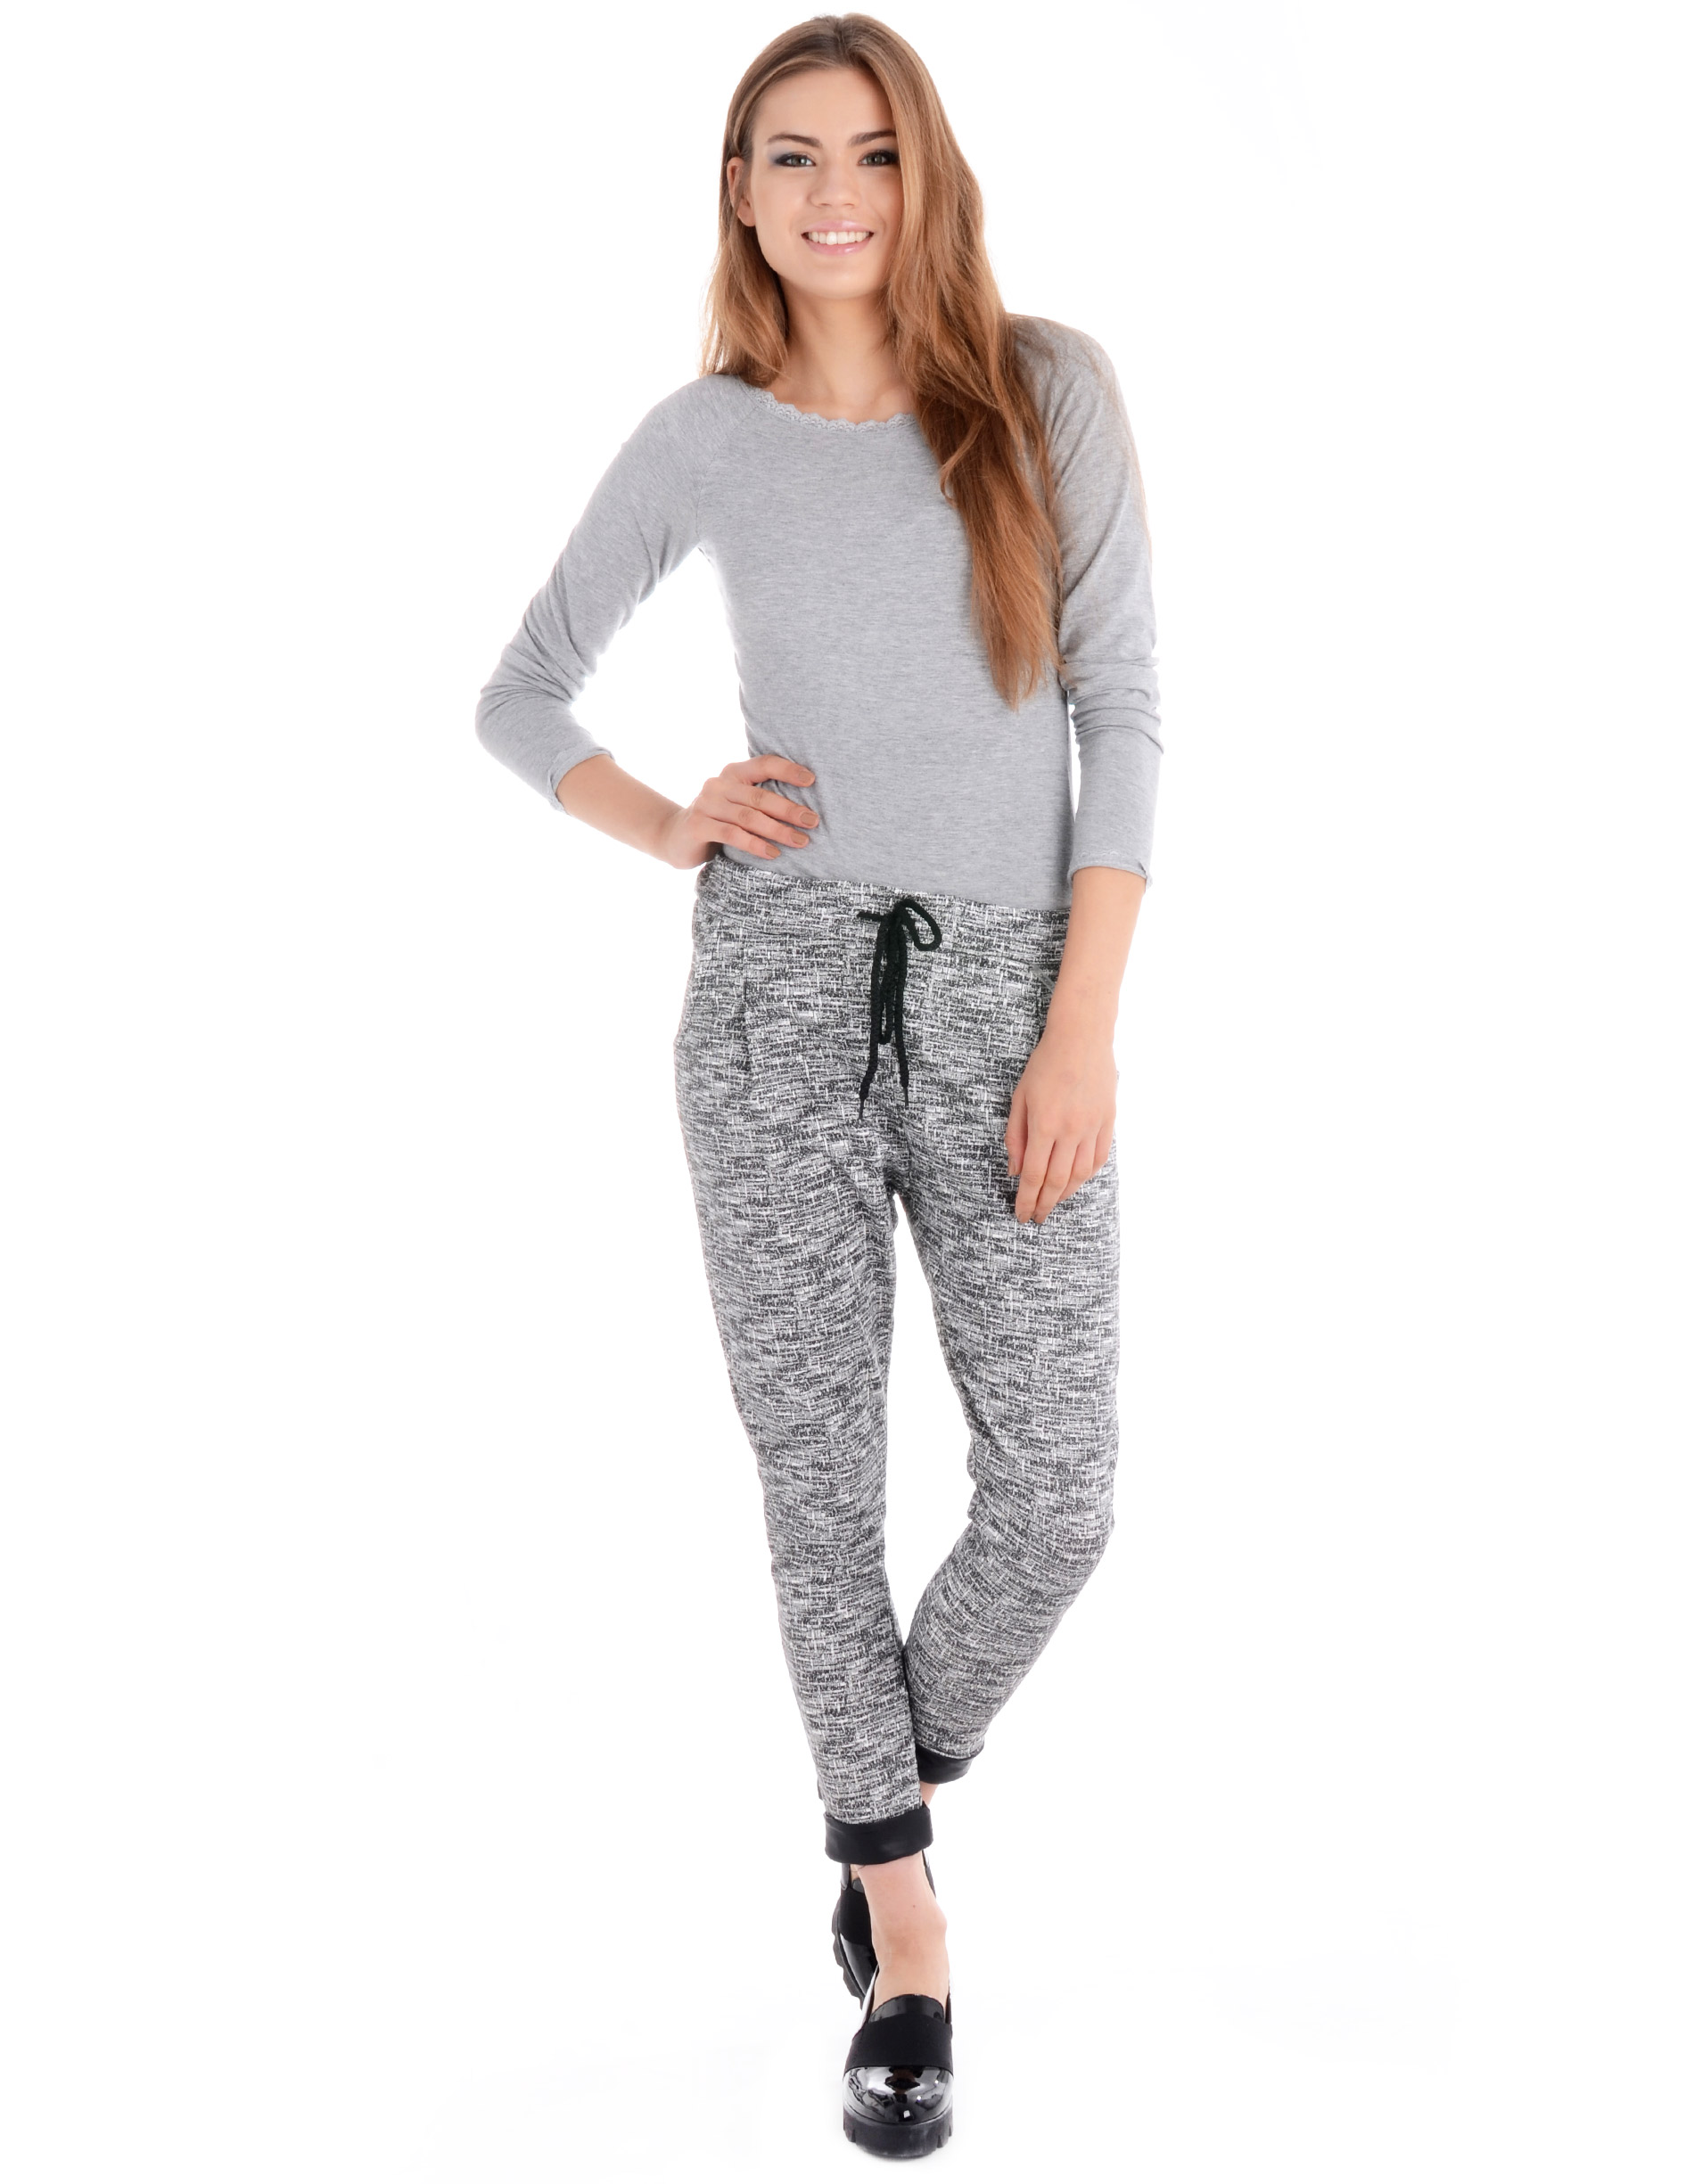 Spodnie - 63-8537 GRIGI - Unisono